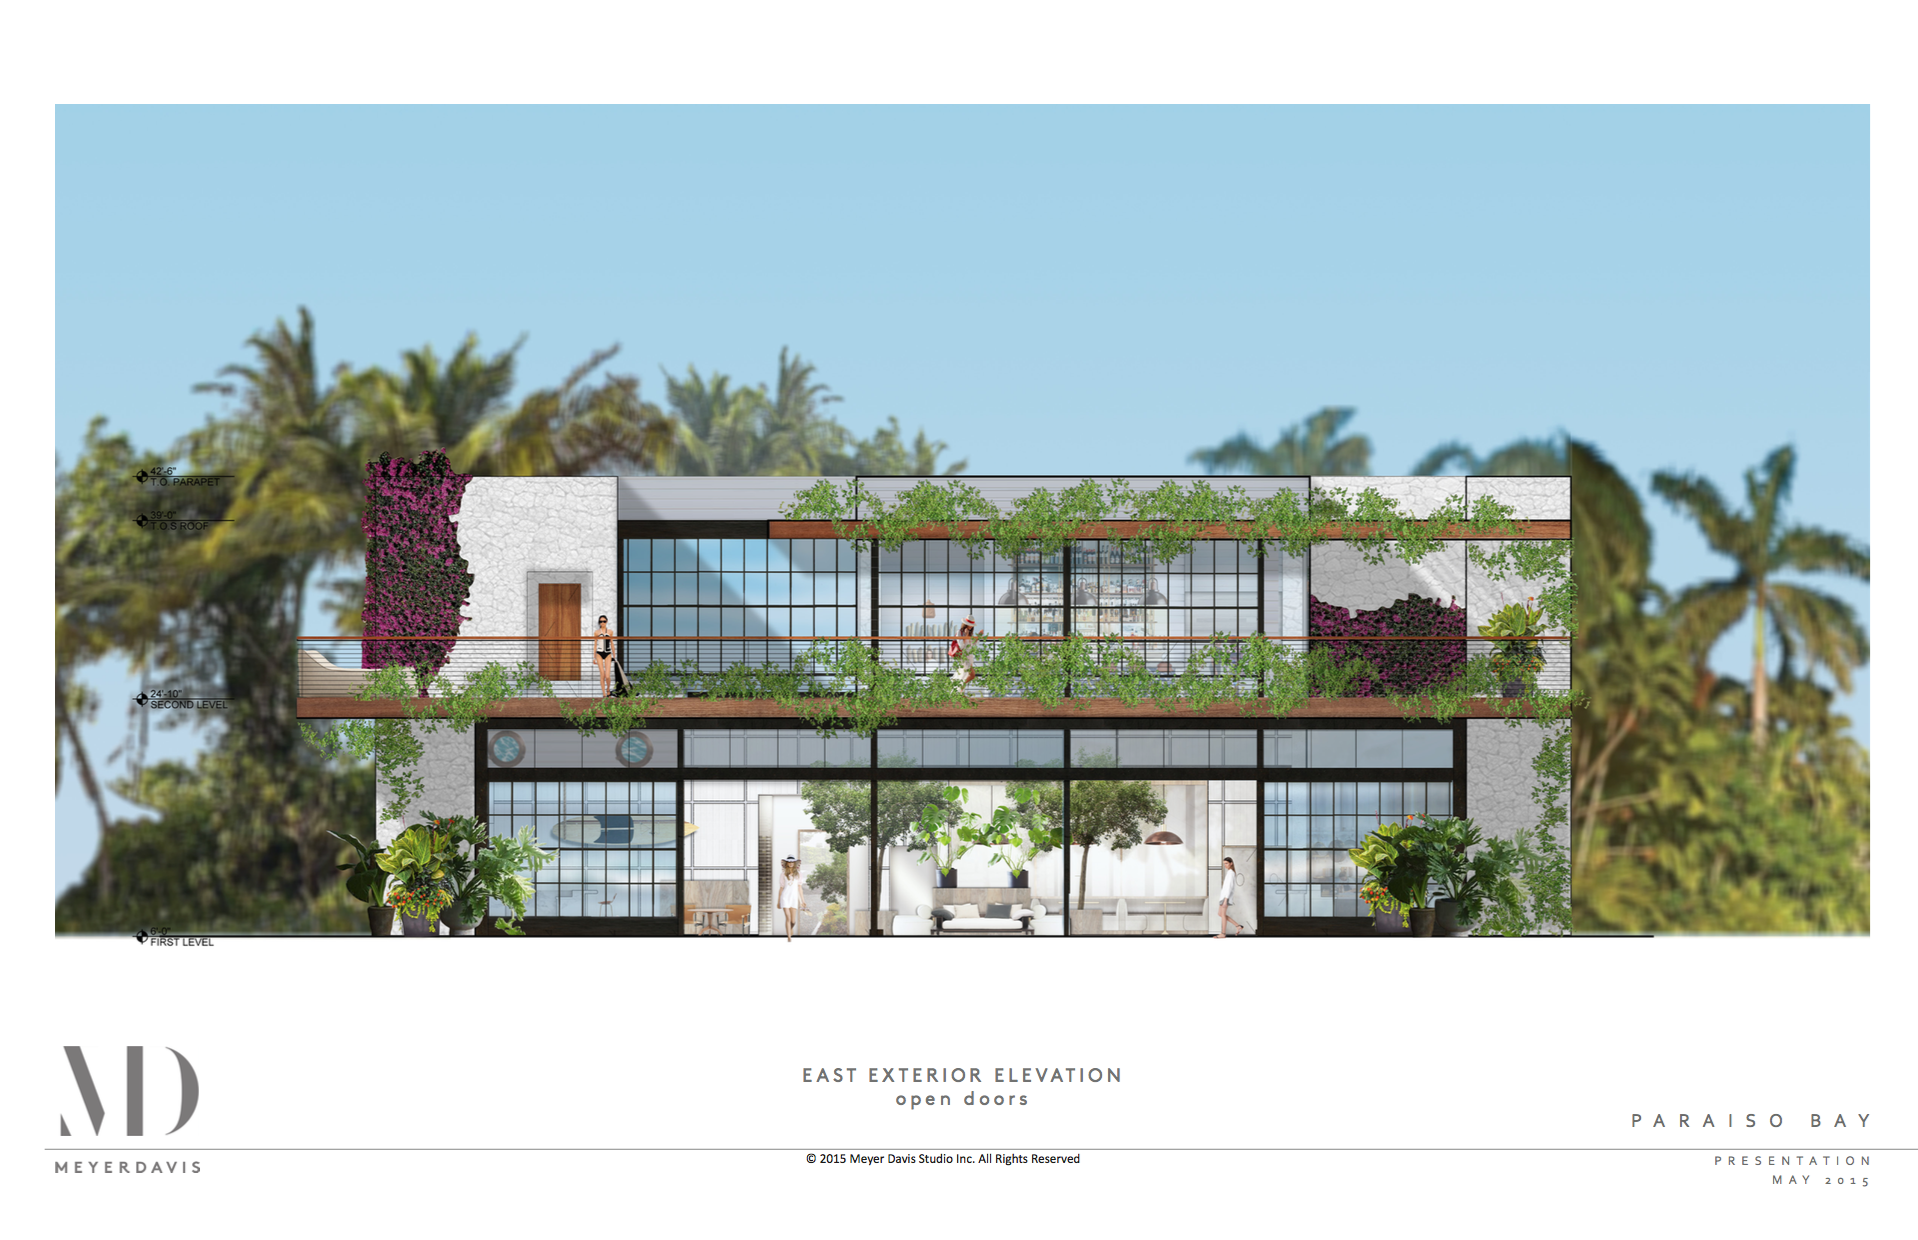 Mia michael schwartz to create restaurant paraiso bay for Architecture firms fort lauderdale